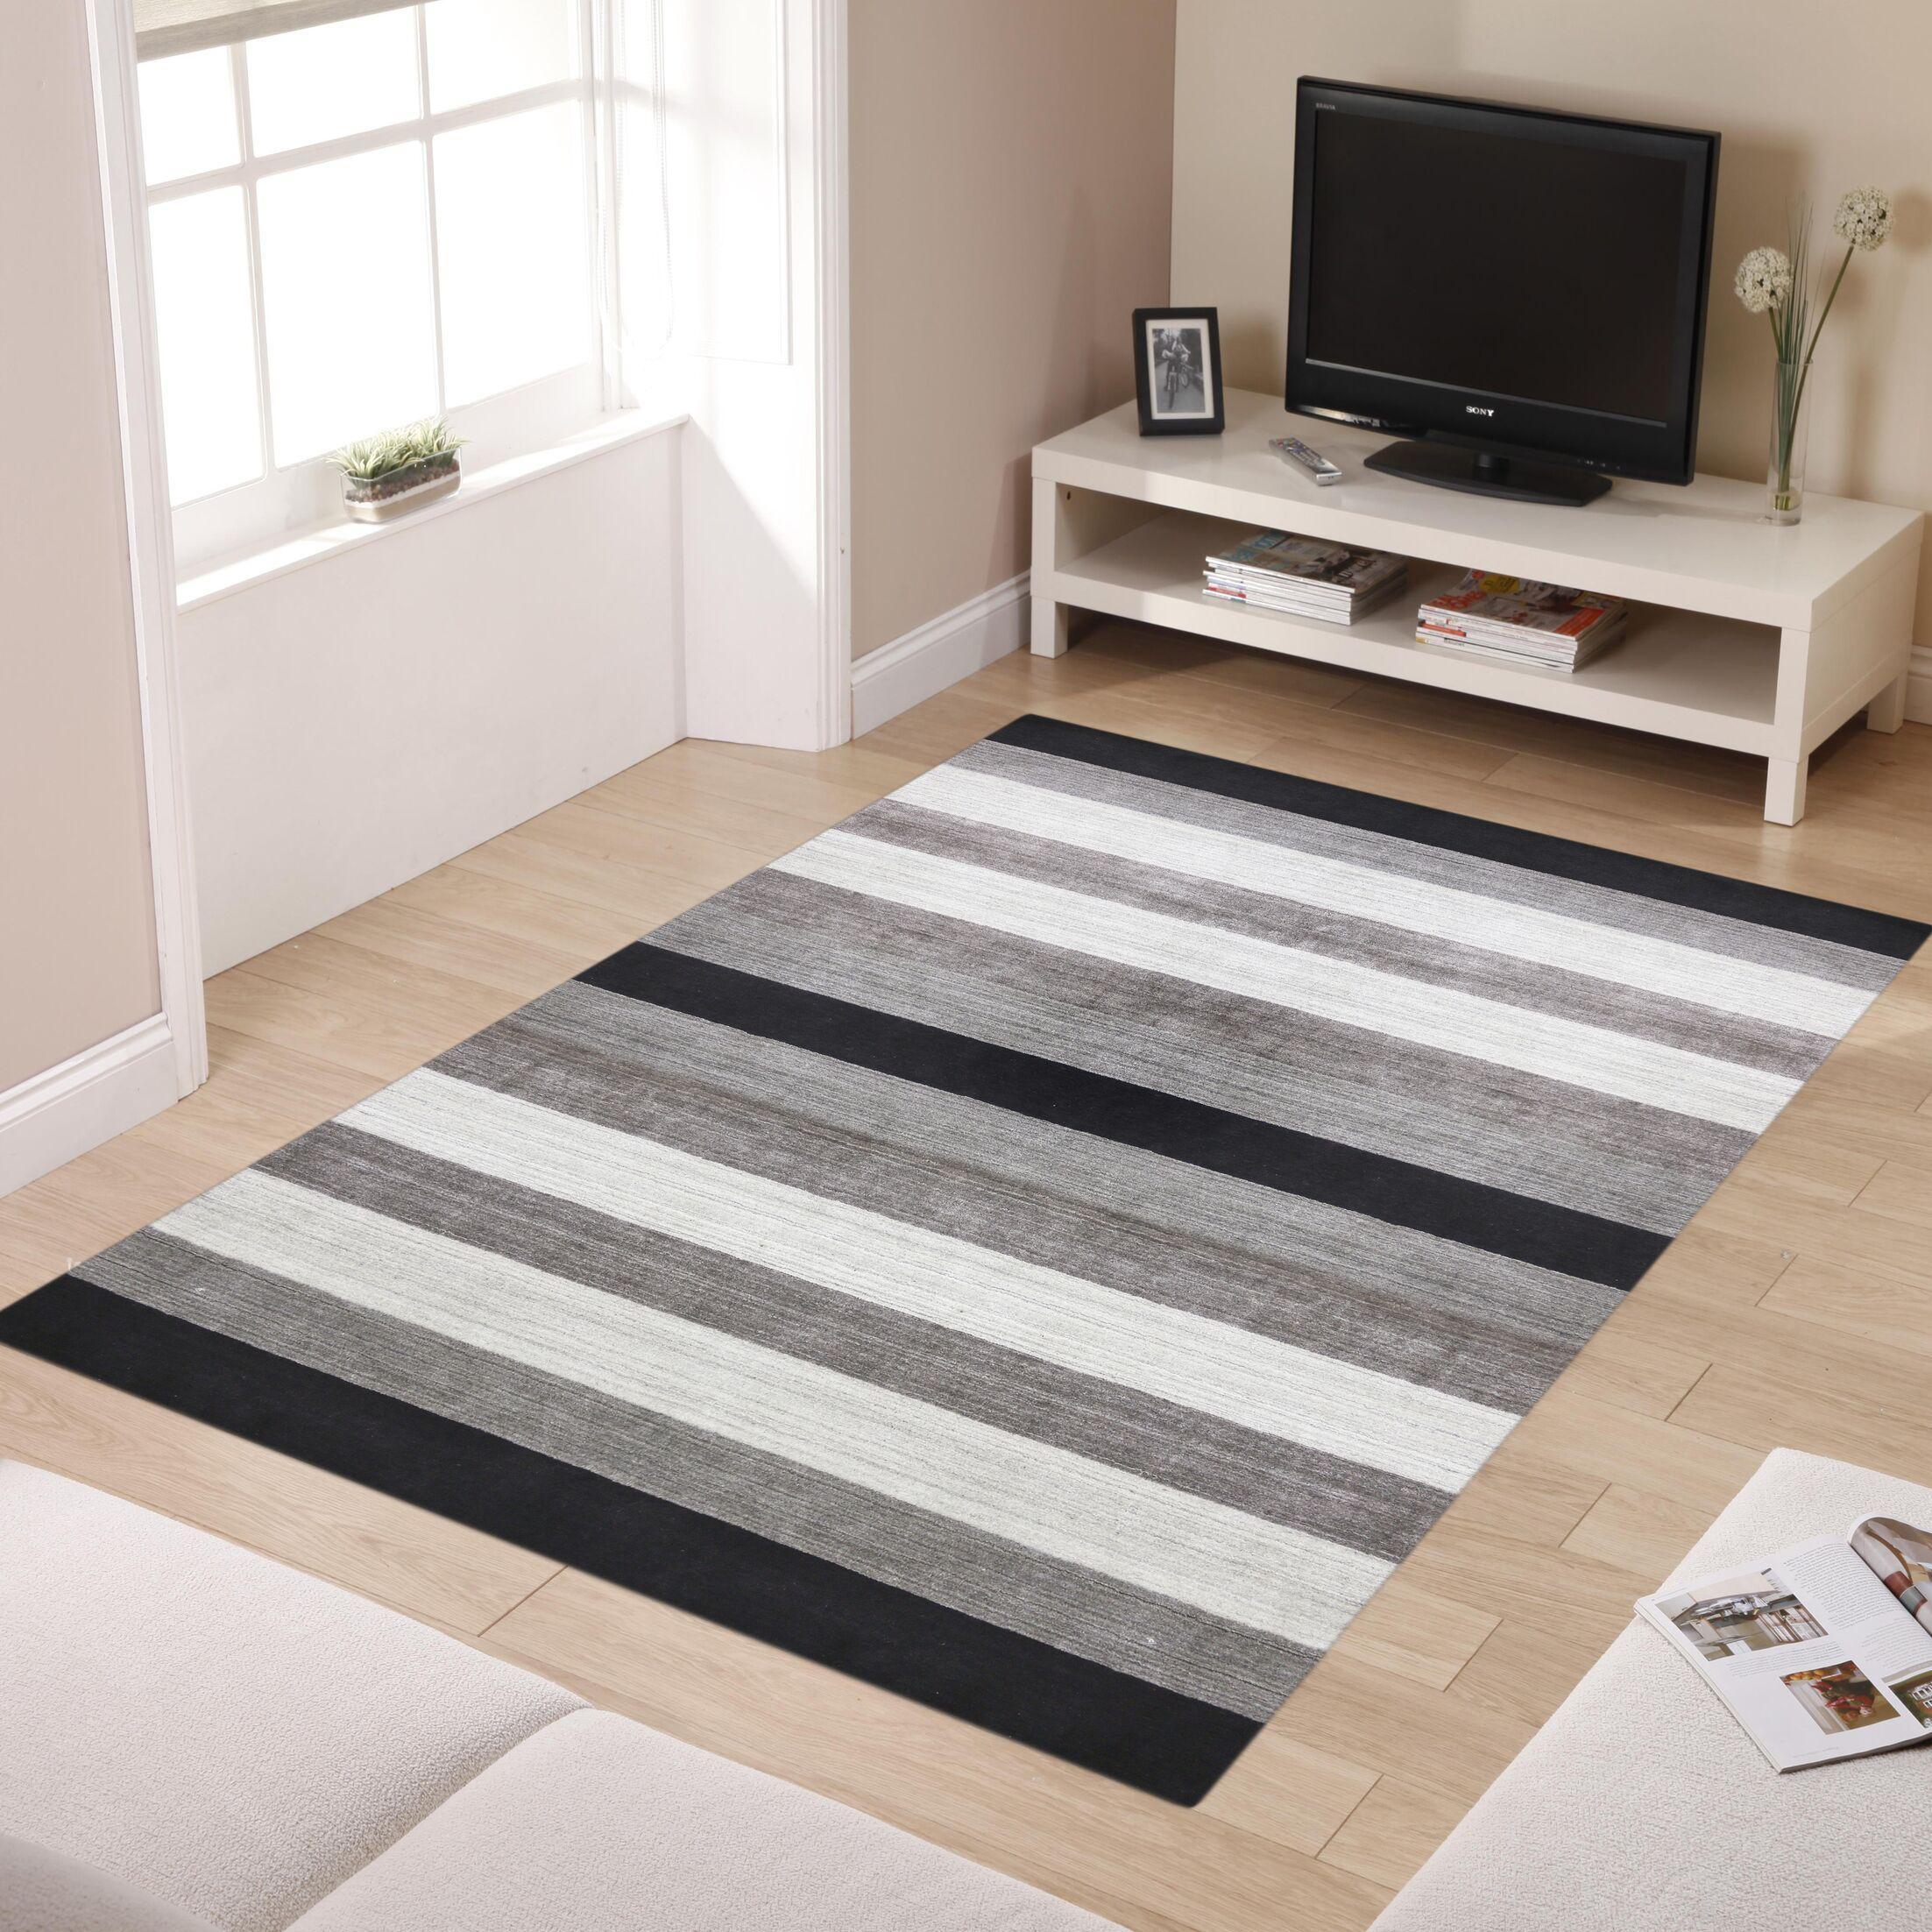 Desousa Hand-Woven Gray/Black Area Rug Rug Size: 8' x 10'